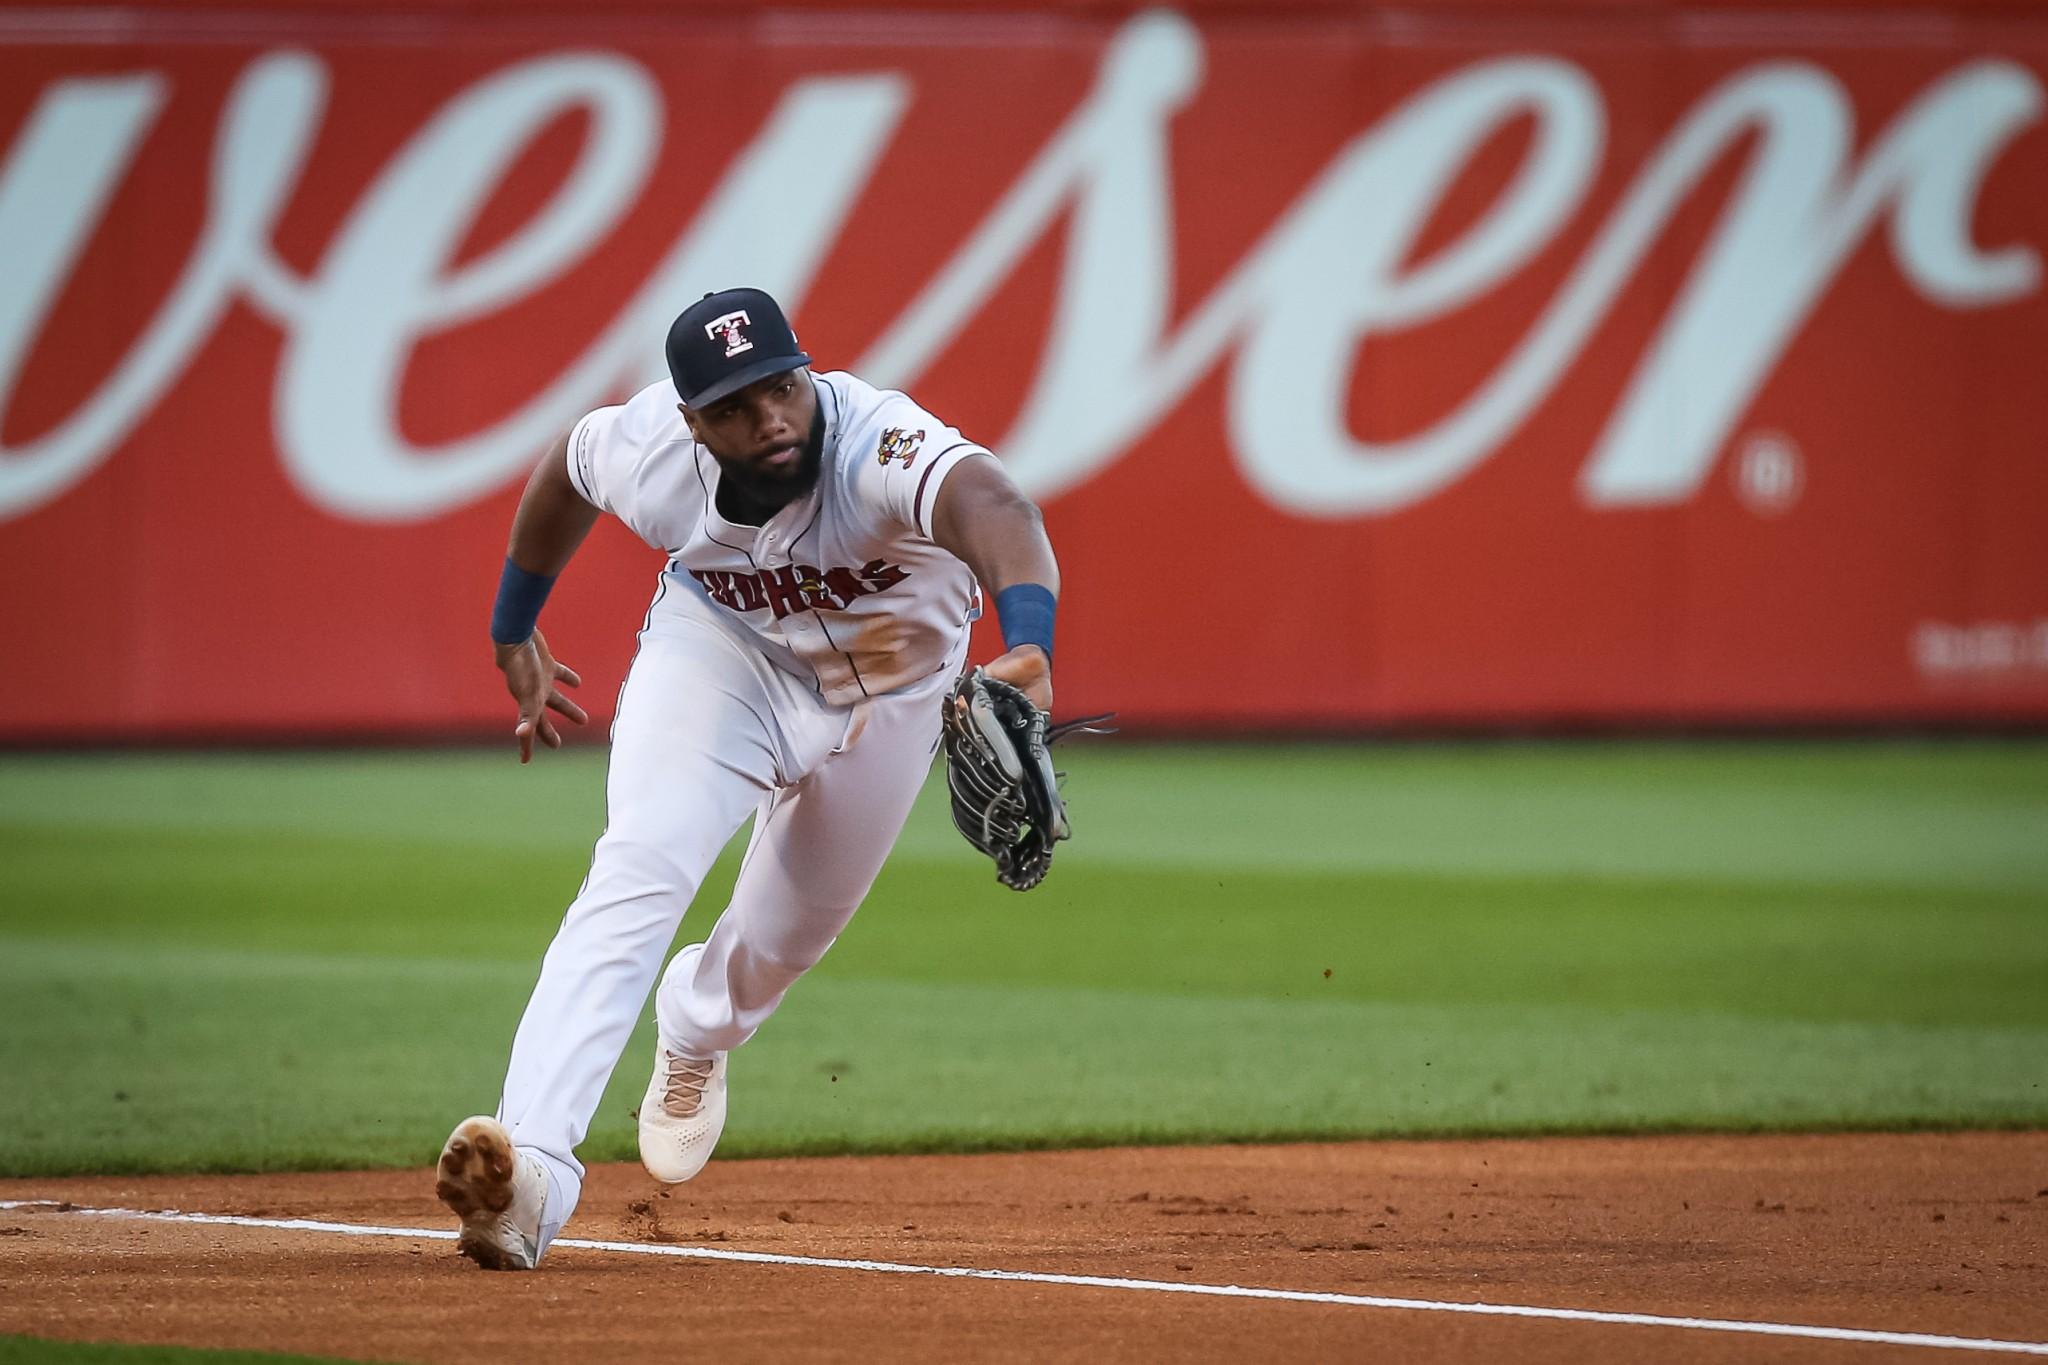 Toledo Mud Hens' third baseman Aderlin Rodriguez, (Photo by Scott Grau courtesy Toledo Mud Hens)